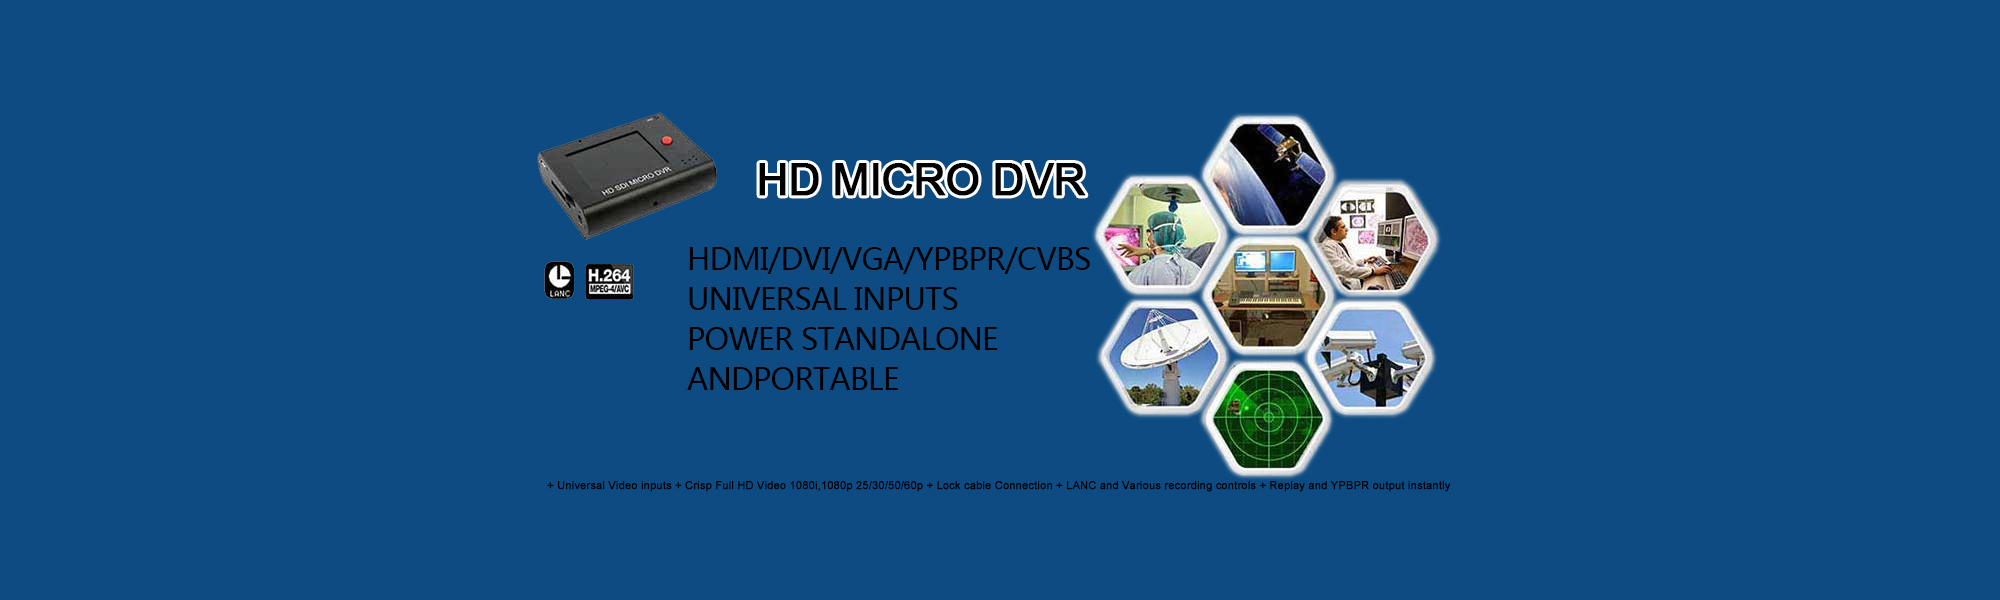 HD Micro DVR